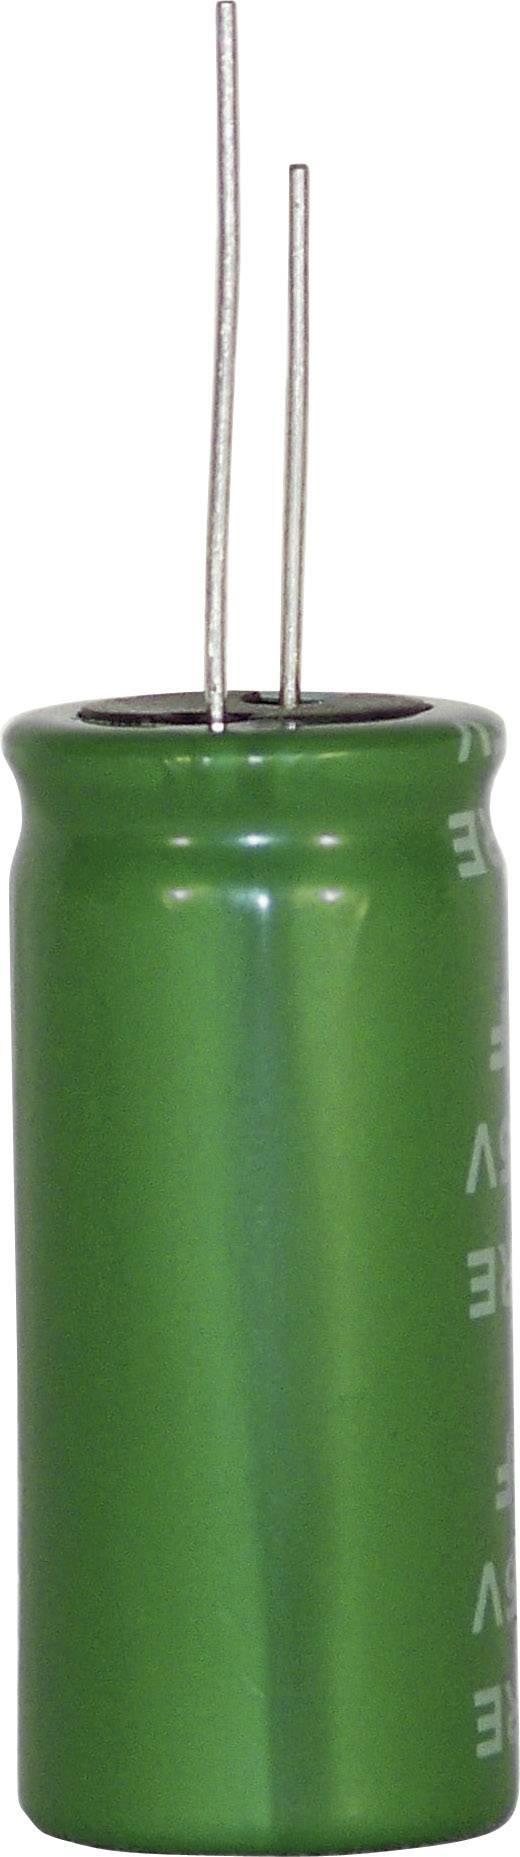 Kondenzátor elektrolytický 2-vrstvový DRC106S03G20RRDAP, 10 F, 2,3 V, 20 %, 20 x 10 mm